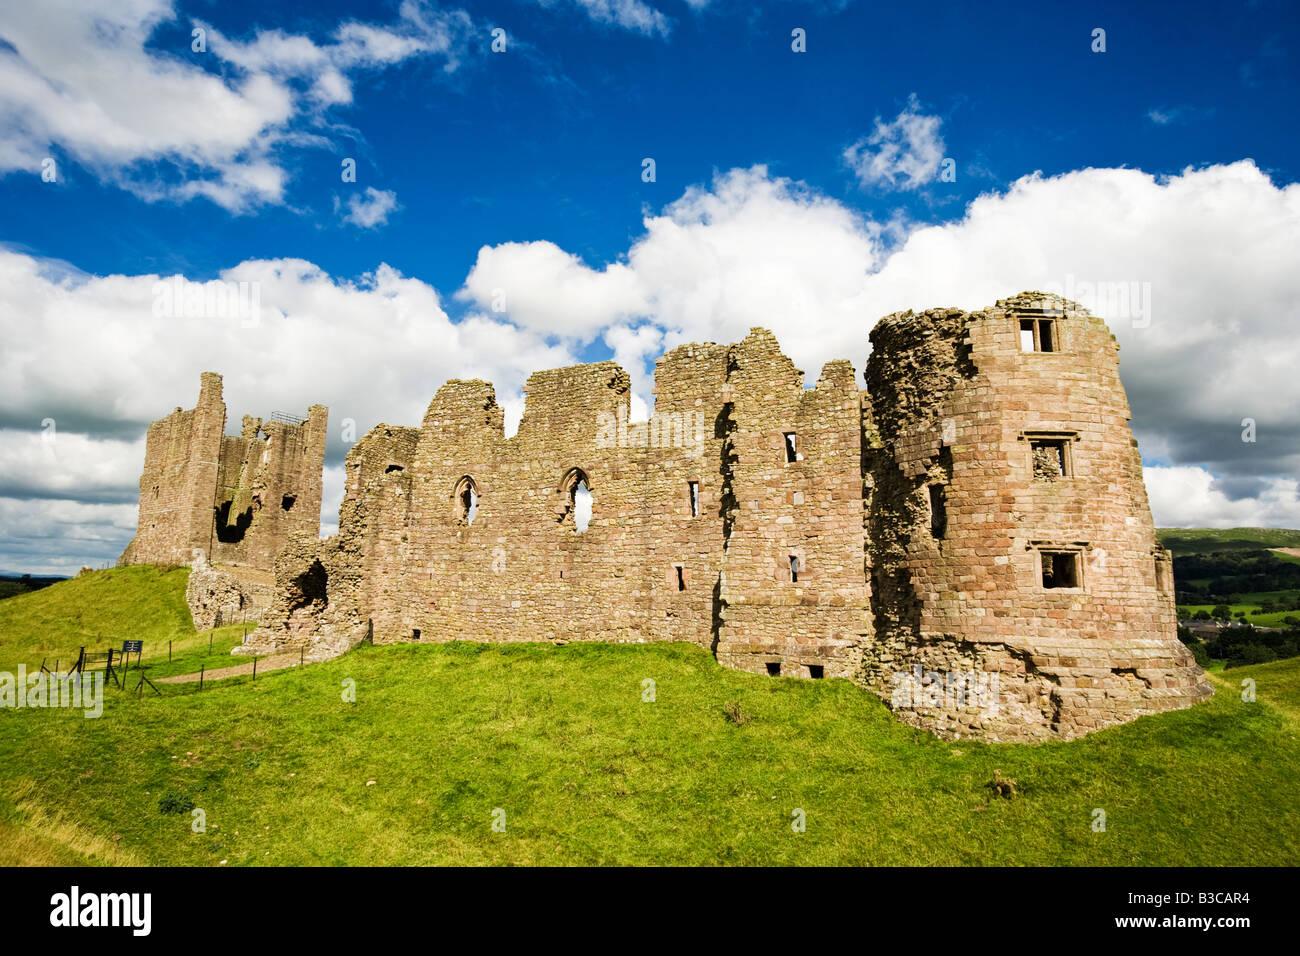 Ruins of Brough Castle in Cumbria, England, UK - Stock Image